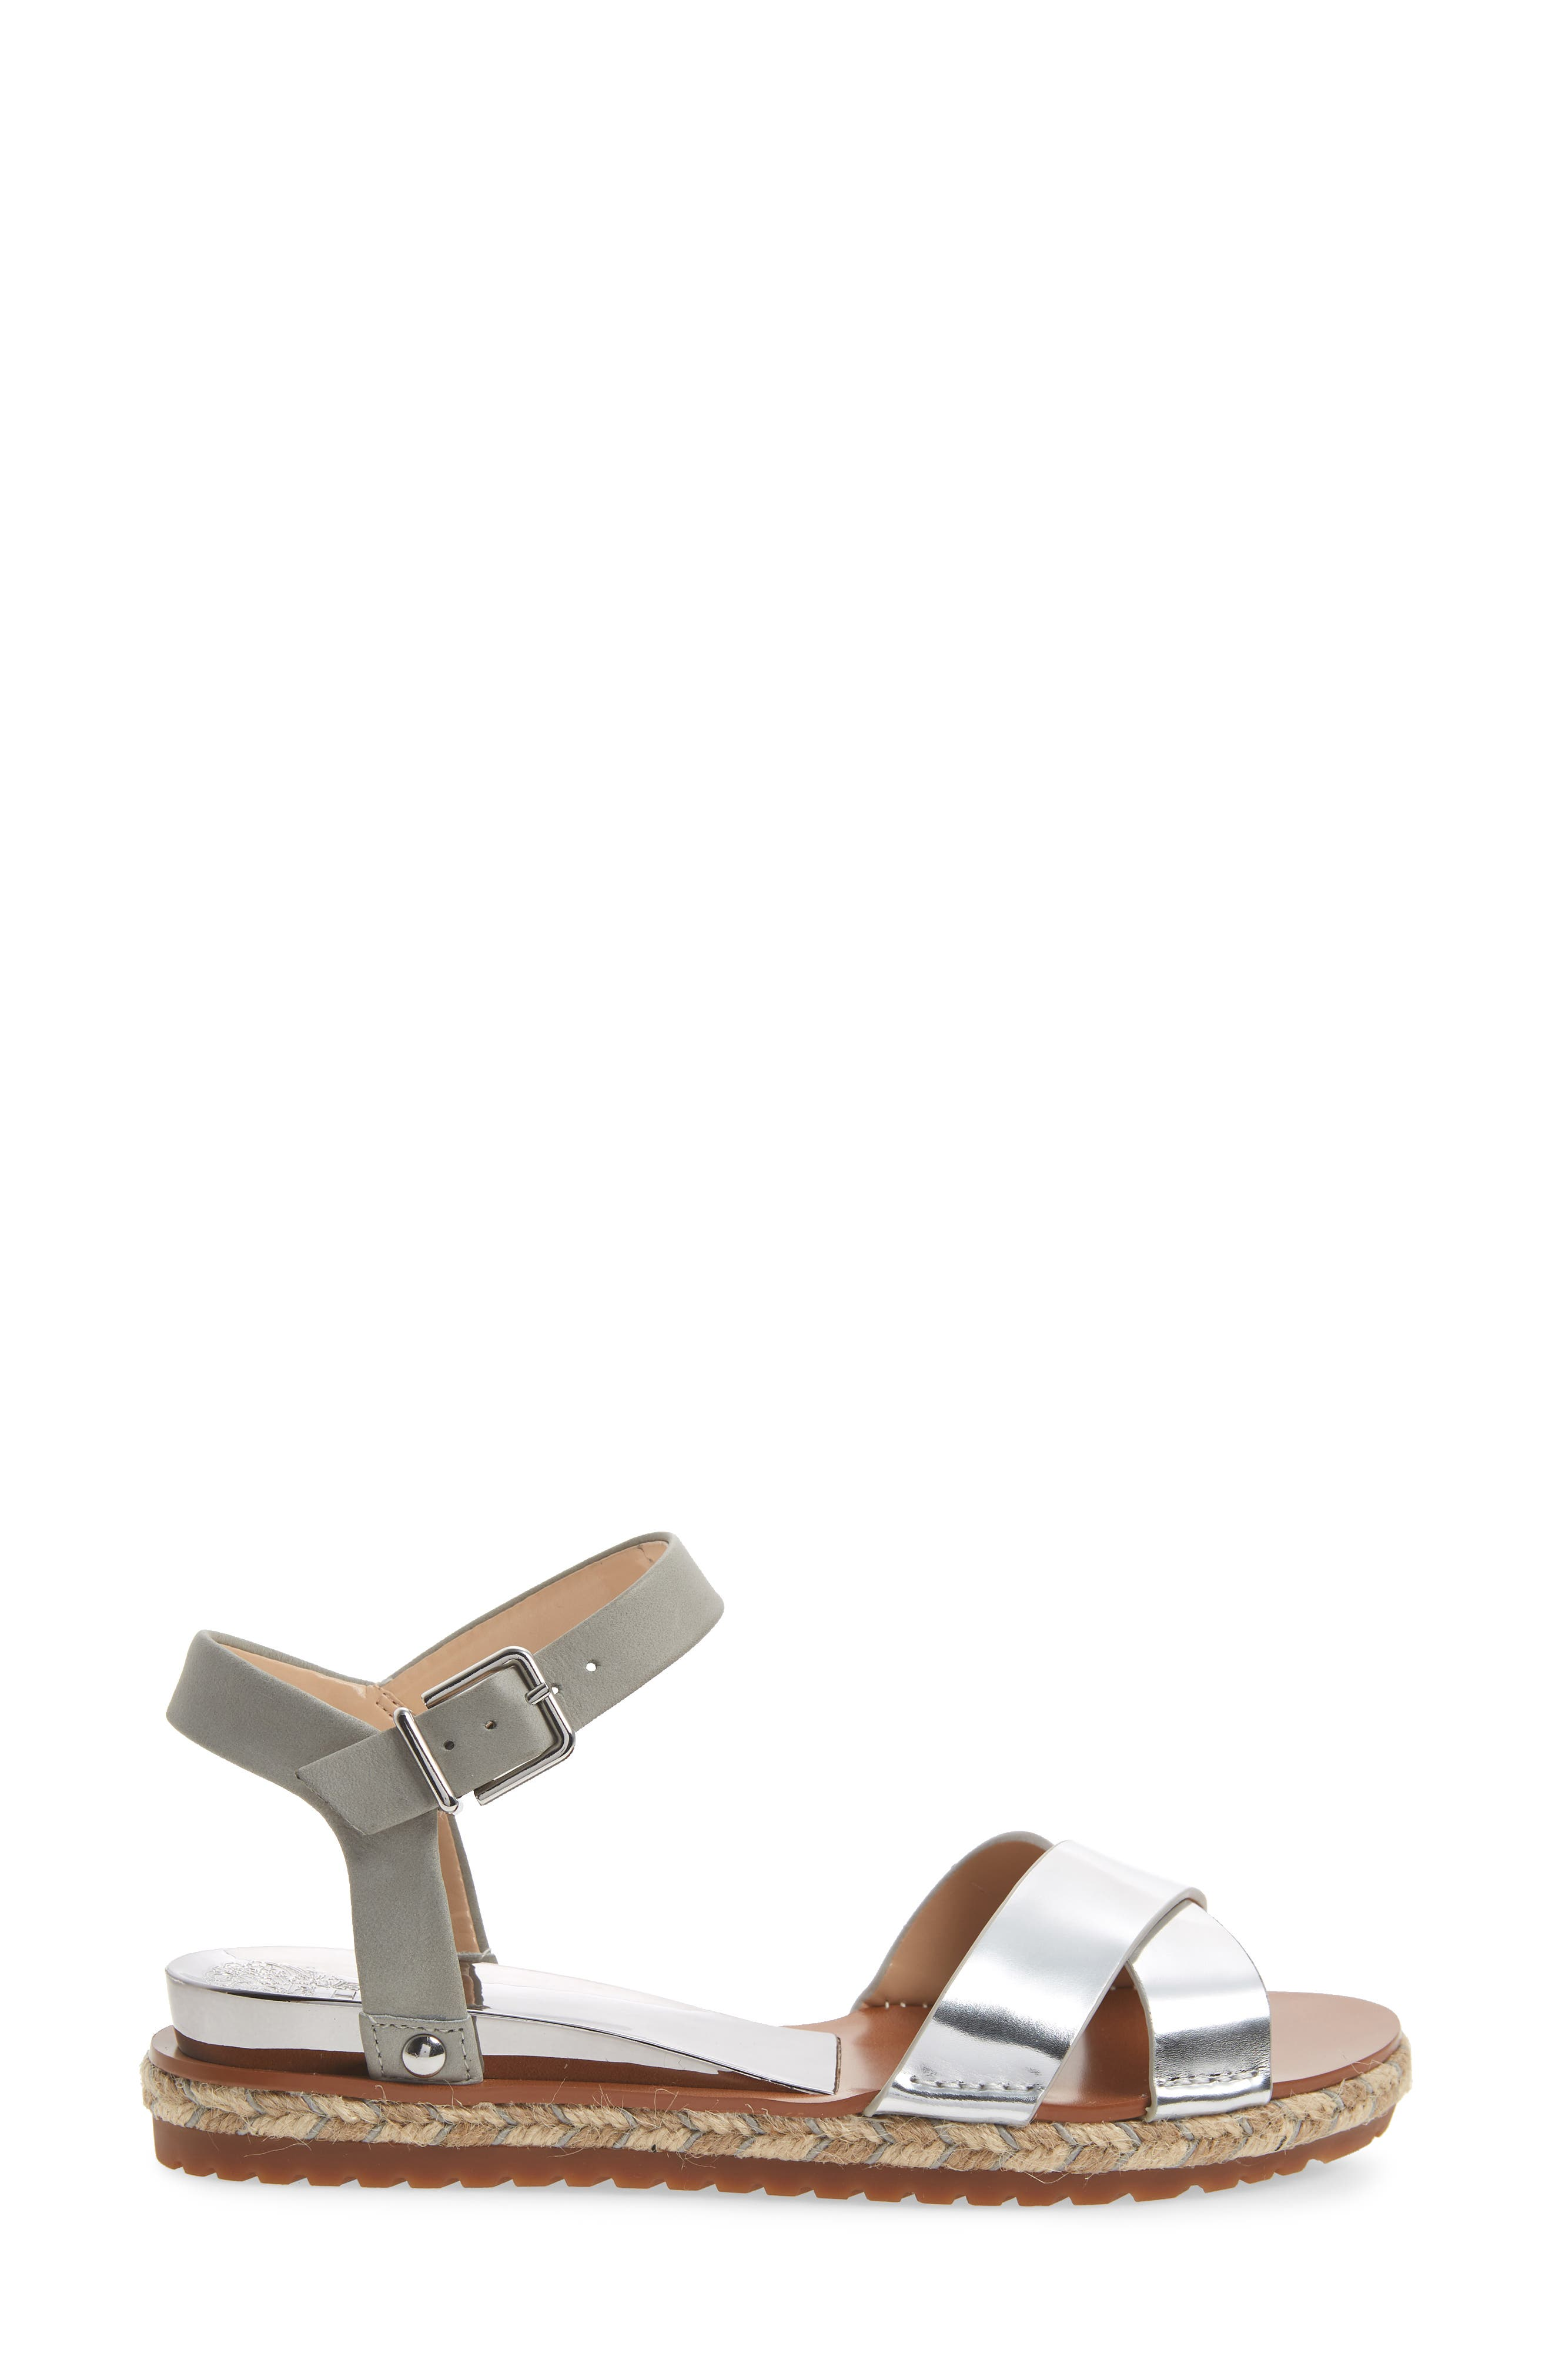 Kankitta Sandal,                             Alternate thumbnail 3, color,                             Cloudy Grey Combo Leather